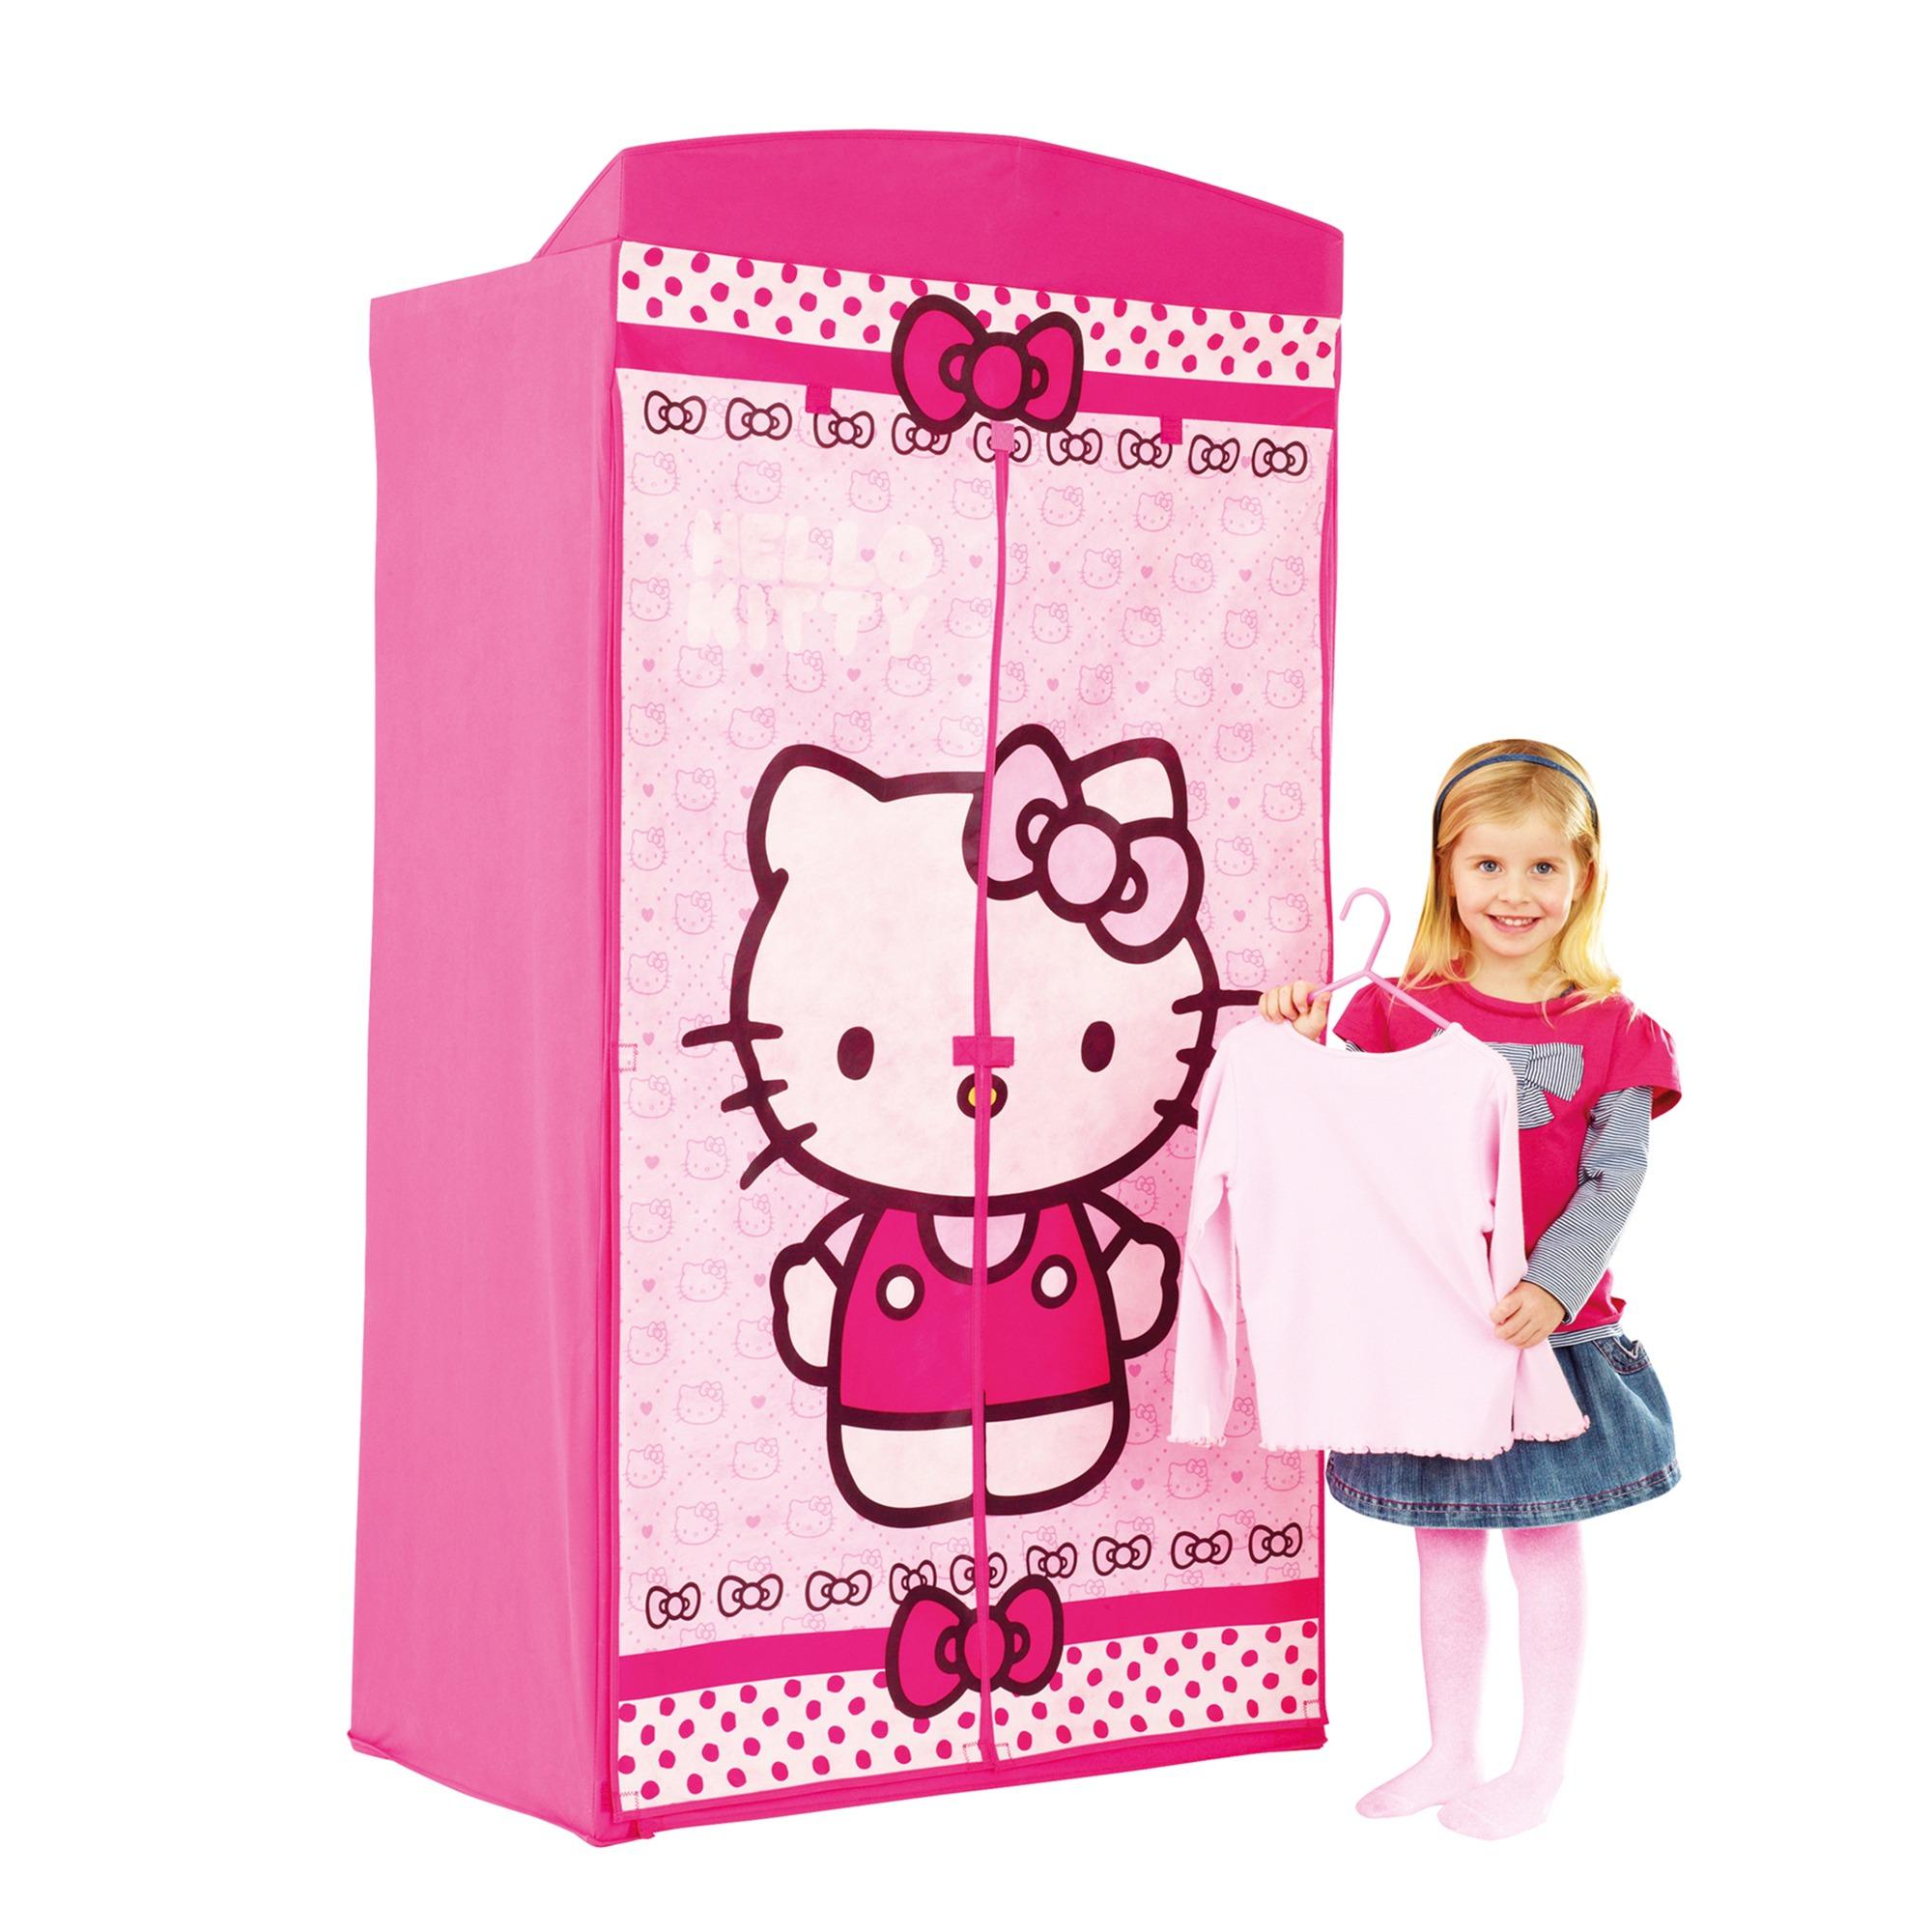 worlds apart armoire penderie en tissu hello kitty. Black Bedroom Furniture Sets. Home Design Ideas